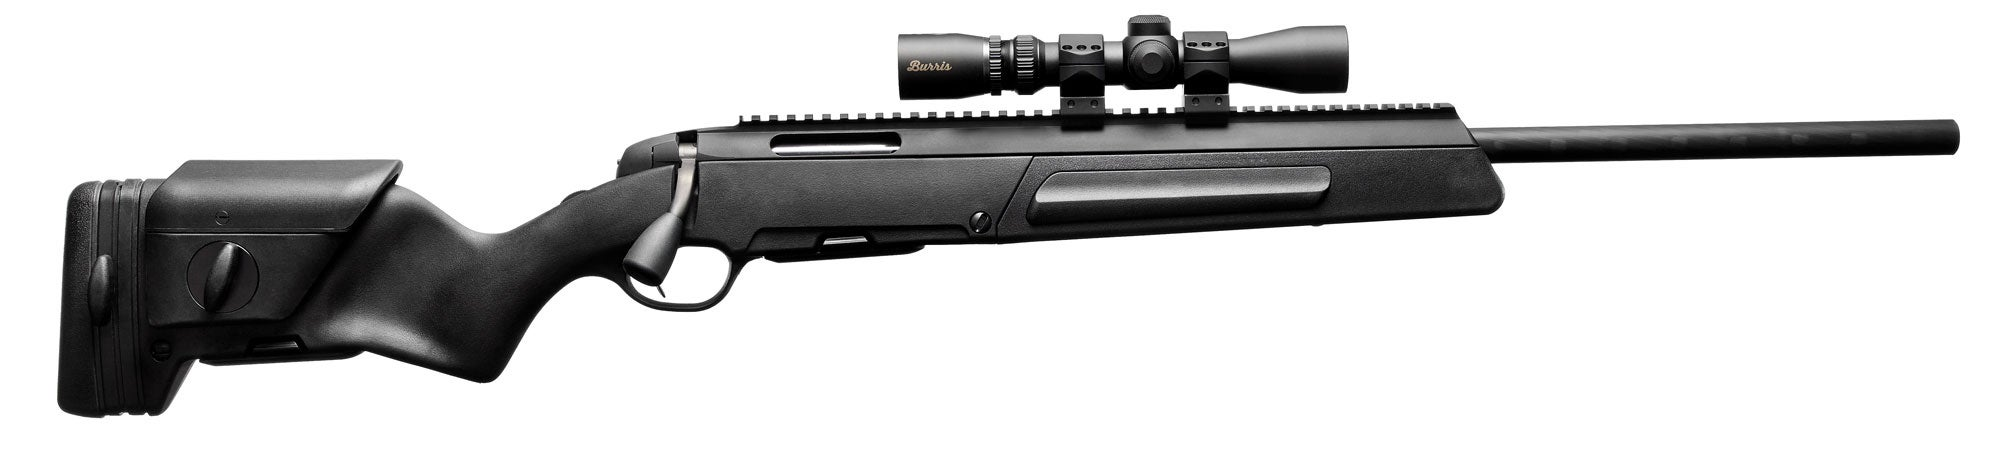 Steyr Scout Elite Rifle